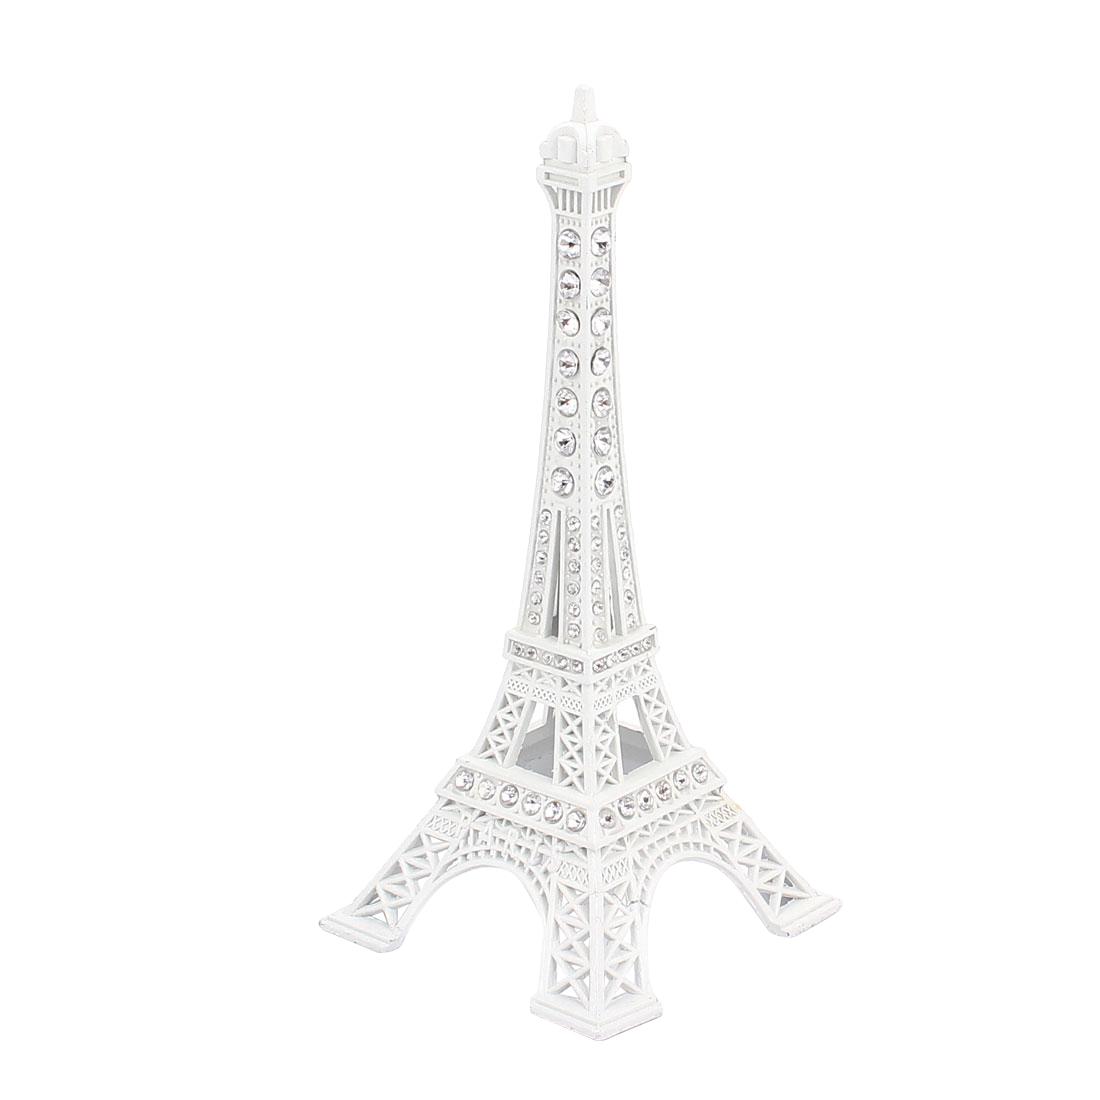 "Mini France Paris Eiffel Tower Sculpture Statue Model Ornament 5"" Height White"